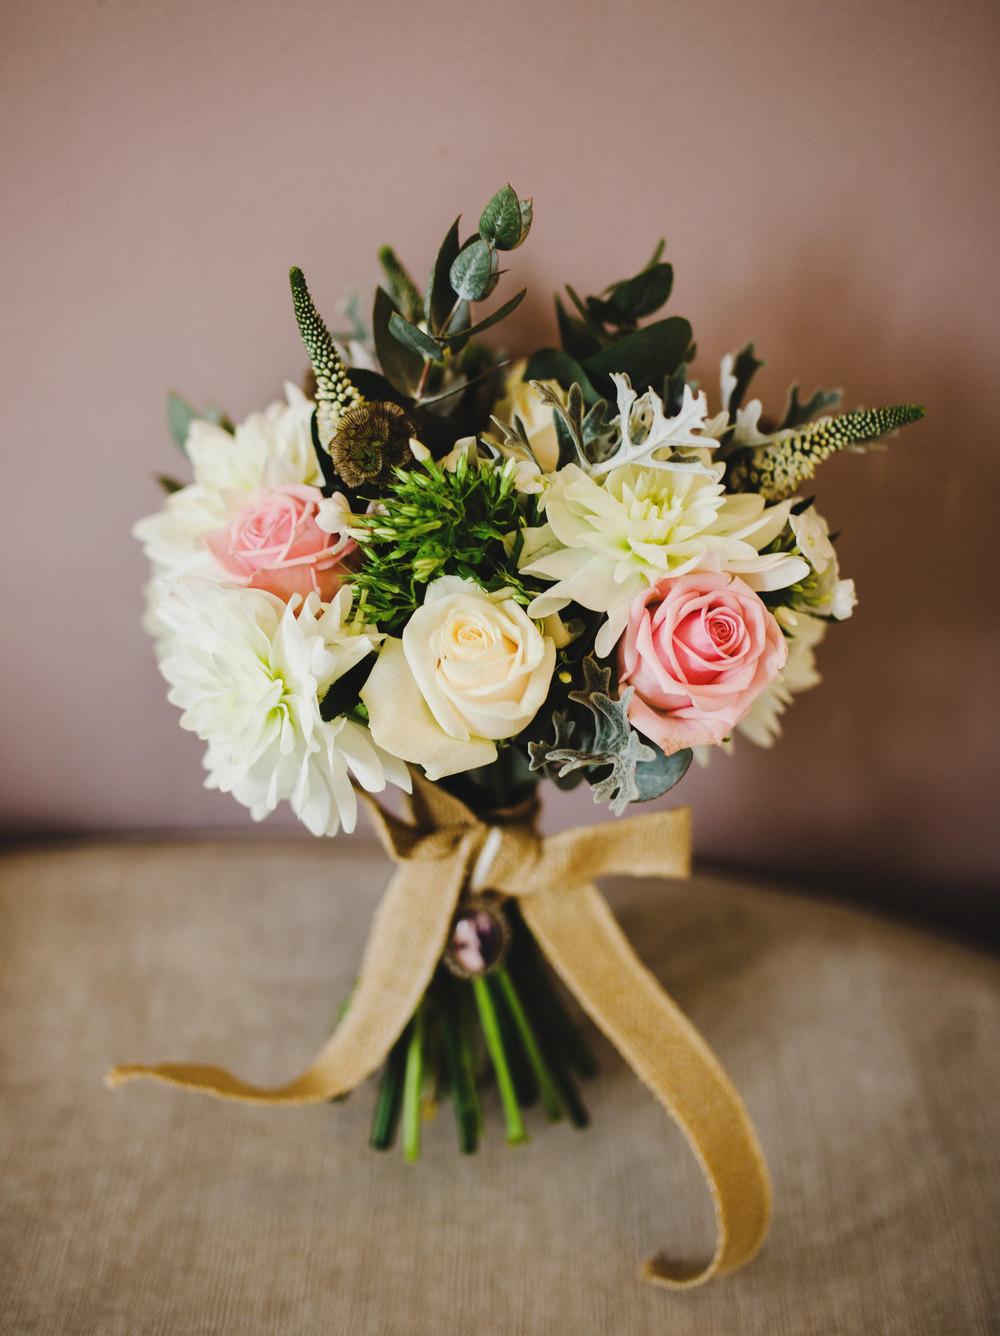 The rustic flower bouquet. -Lancashire wedding photograpy